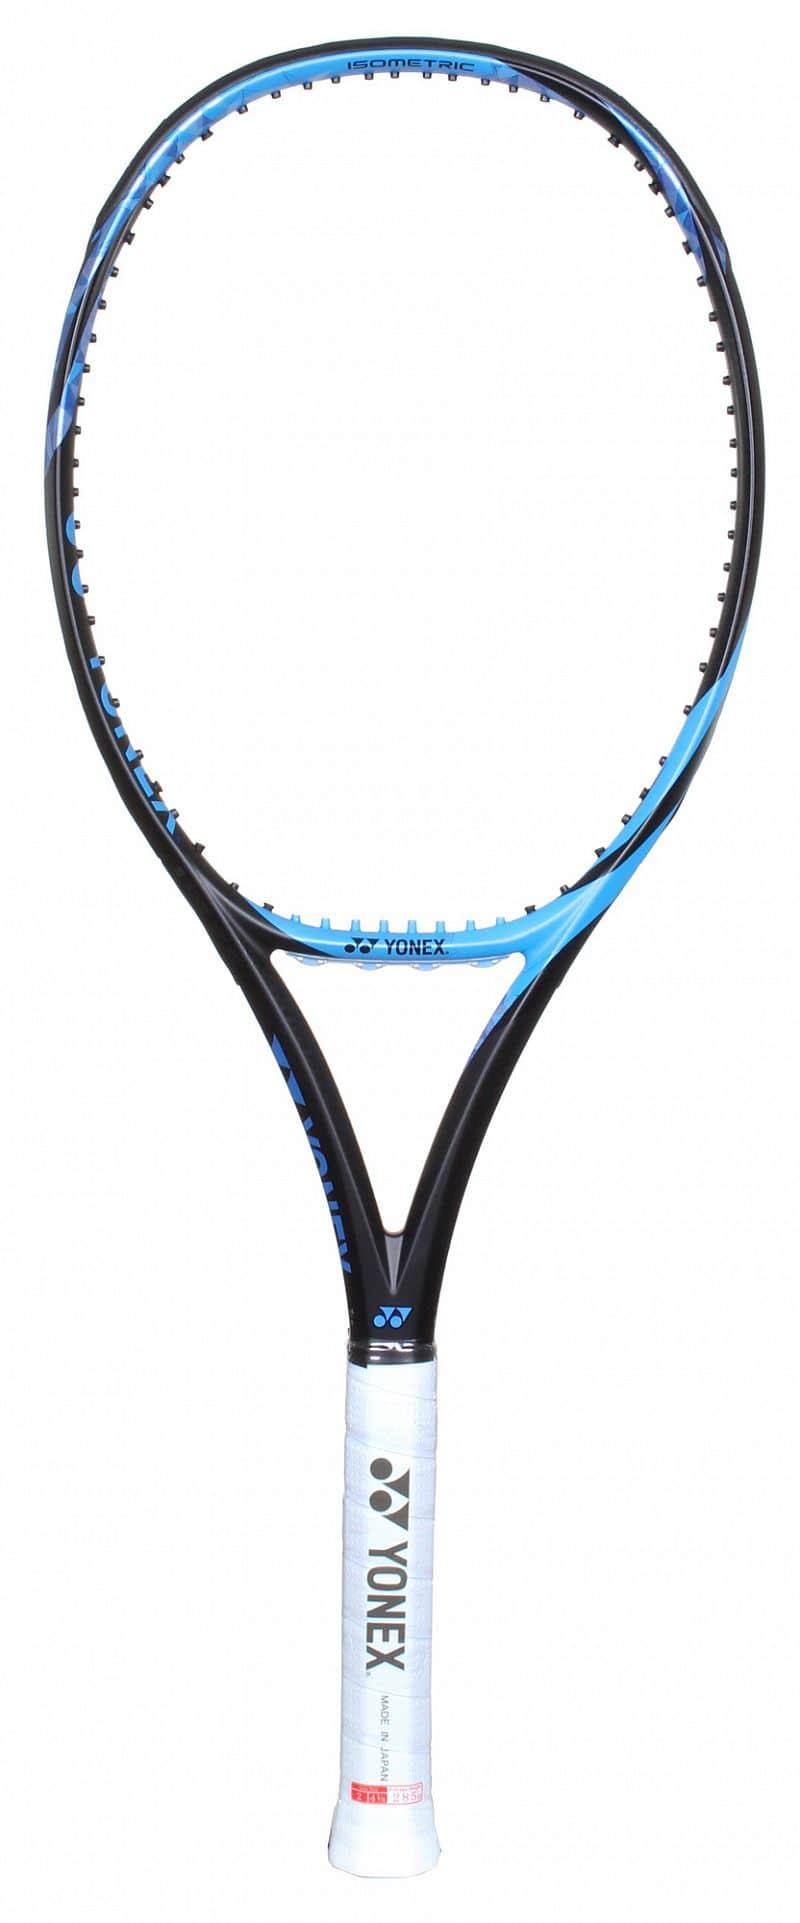 EZONE 98 Lite 2017 tenisová raketa barva: modrá;grip: G3